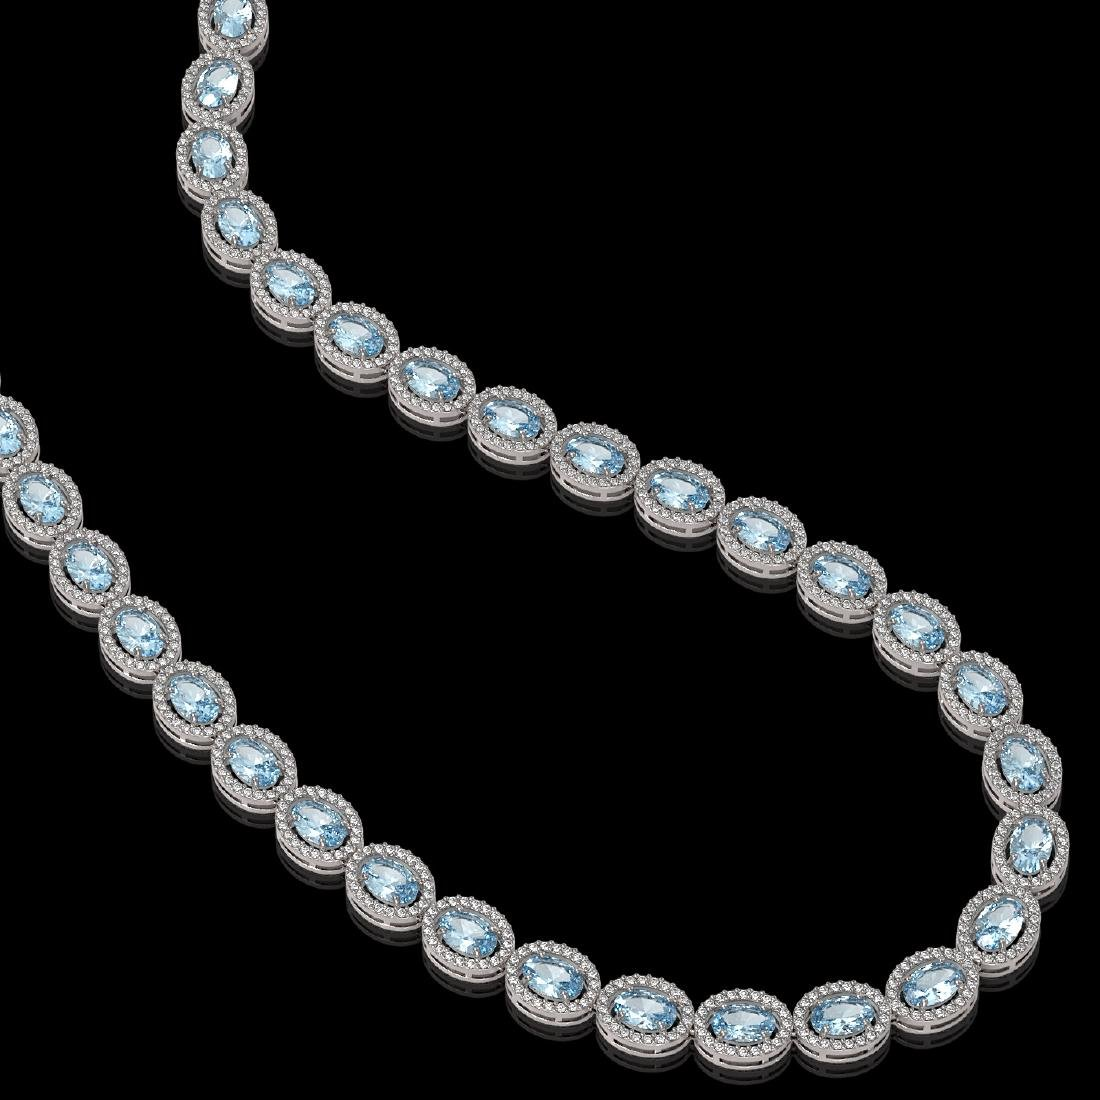 24.65 CTW Aquamarine & Diamond Halo Necklace 10K White - 2